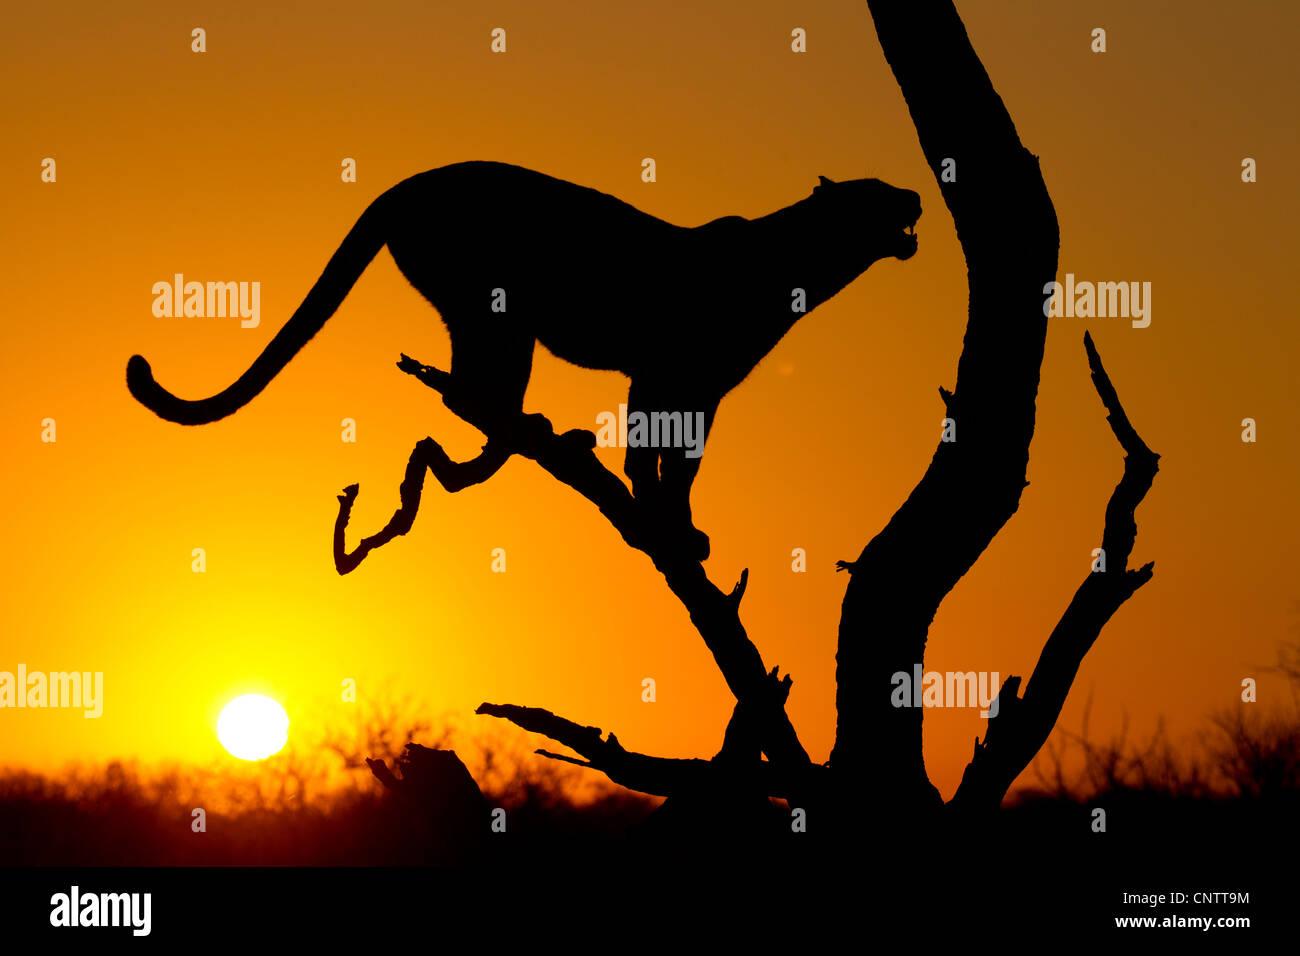 Afrikanischer Leopard (Panthera Pardus) bei Sonnenaufgang, Silhouette, Südafrika Stockbild